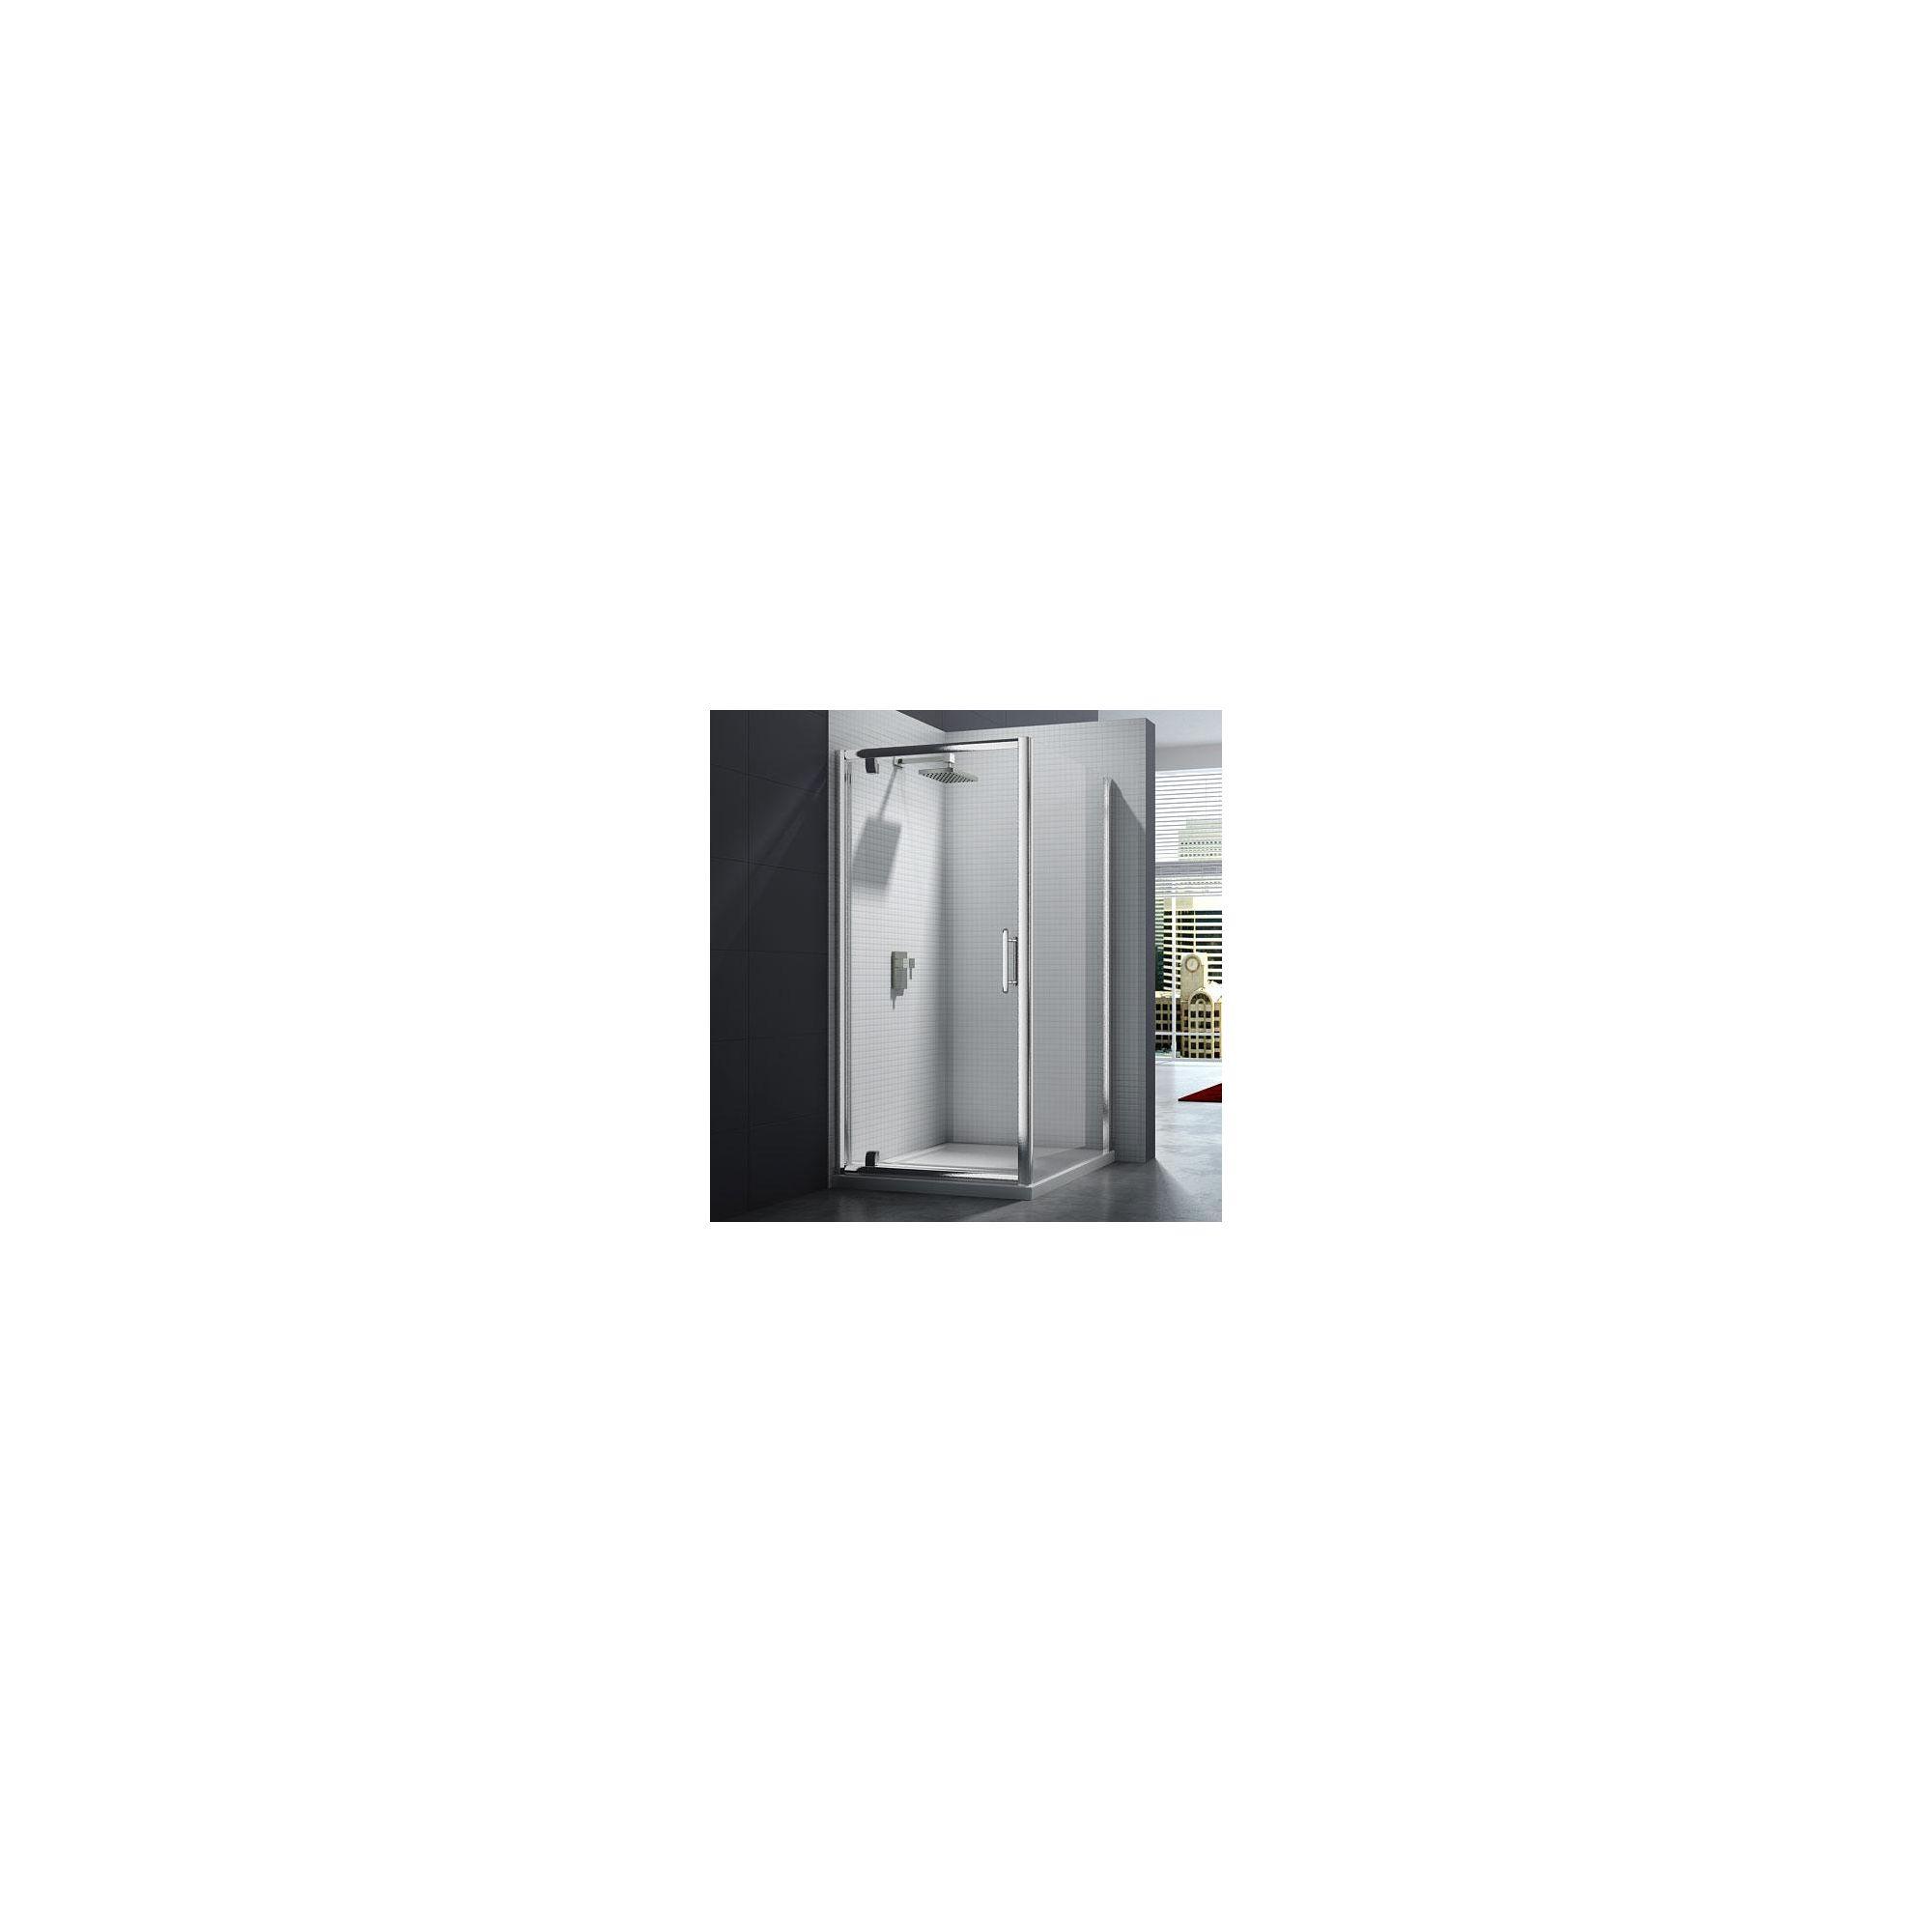 Merlyn Series 6 Pivot Shower Door, 700mm Wide, Chrome Frame, 6mm Glass at Tesco Direct